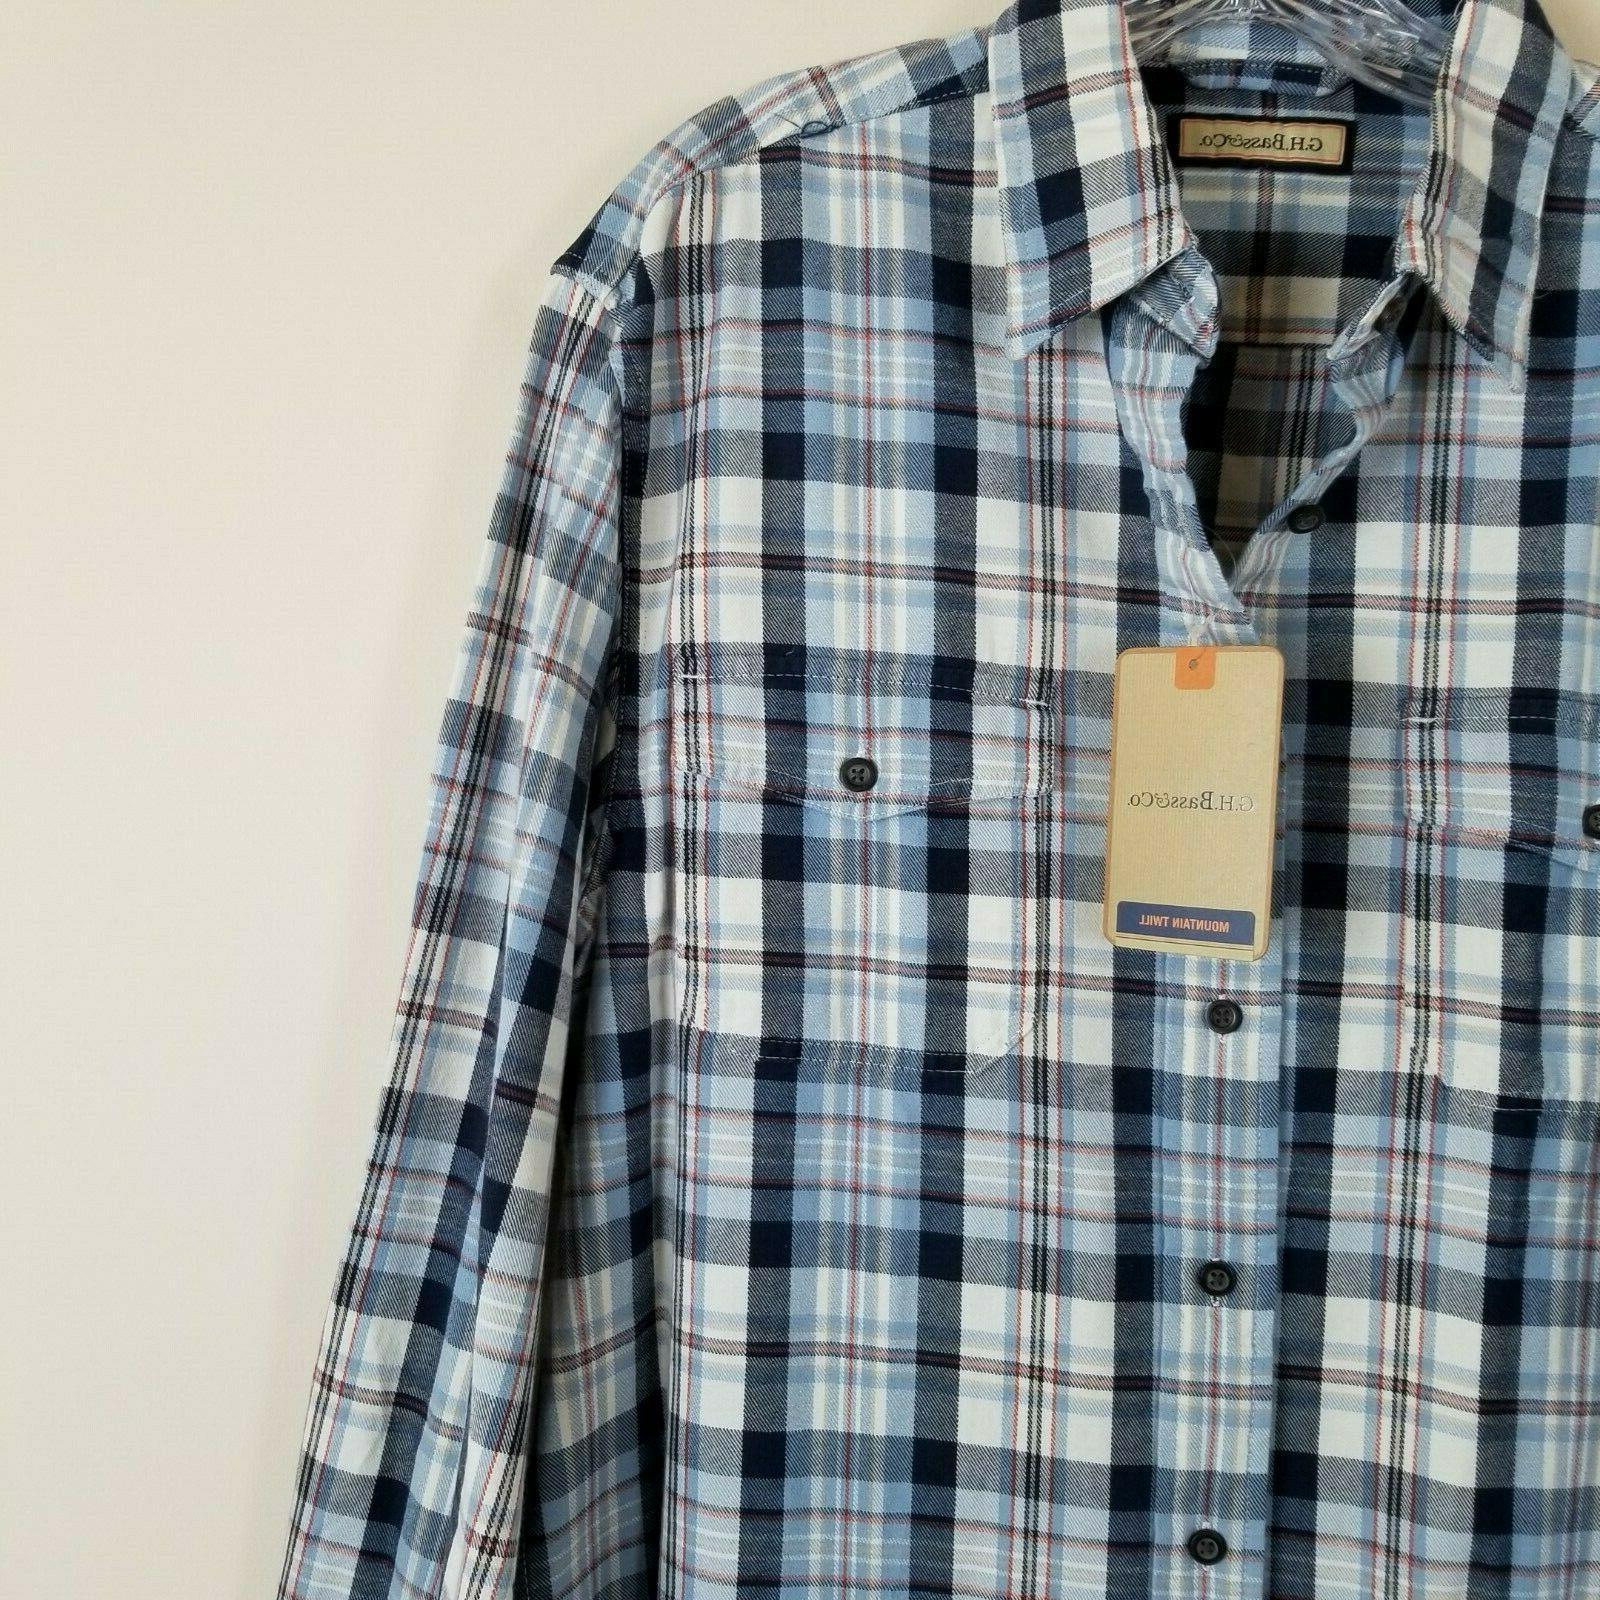 G.H. Bass Mountain Twill Shirt White Medium NEW